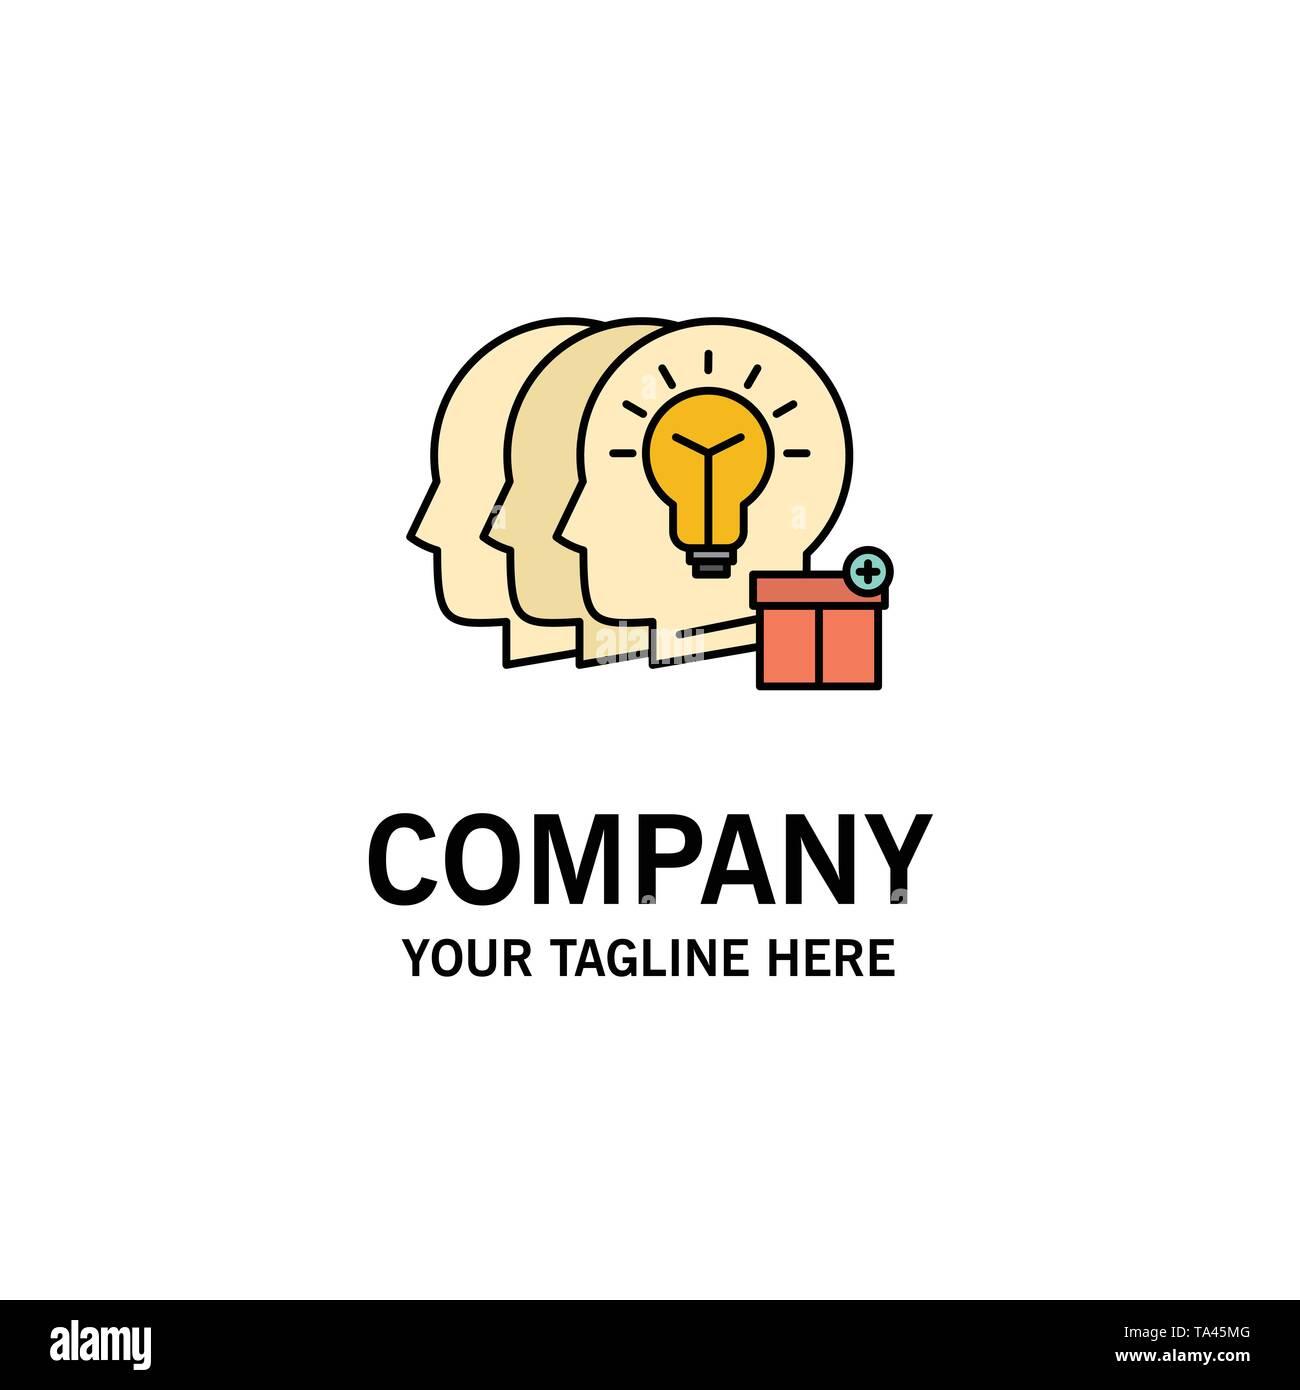 Idee, Teilen, Transfer, Personal Business Logo Vorlage. Flachen Farbe Stockbild